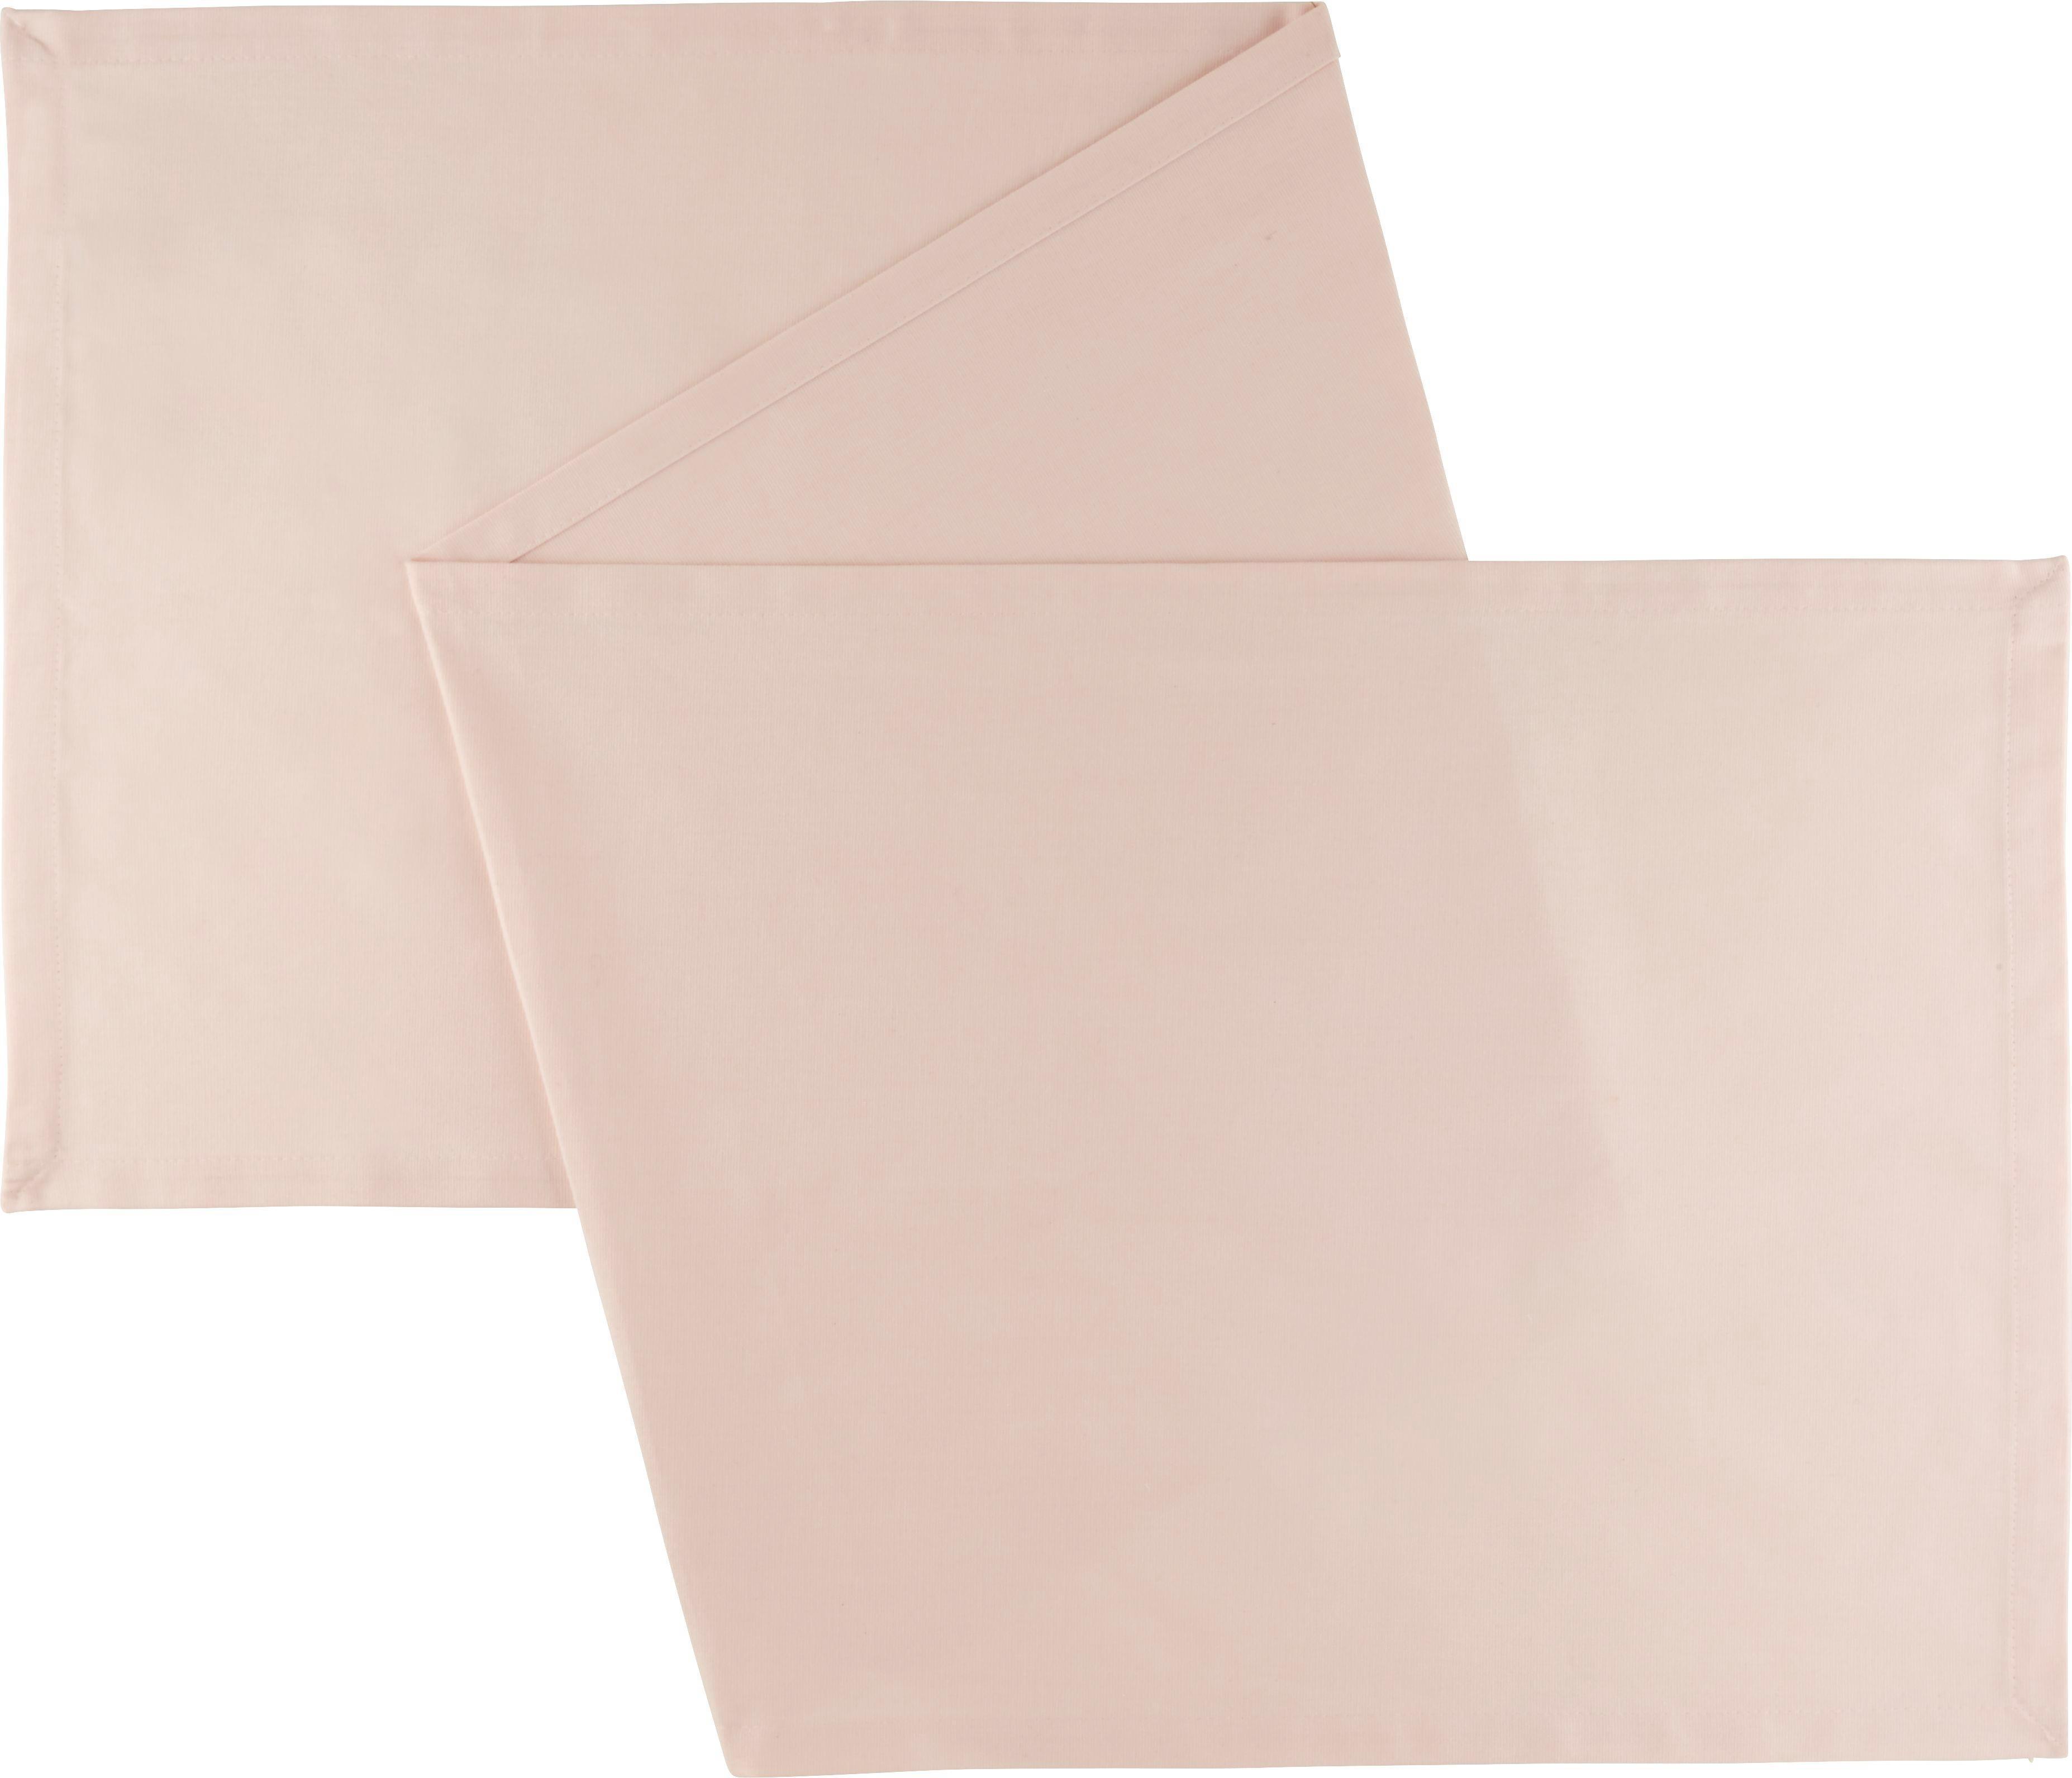 Nadprt Steffi Überlänge - umazano roza, tekstil (45/240cm) - MÖMAX modern living